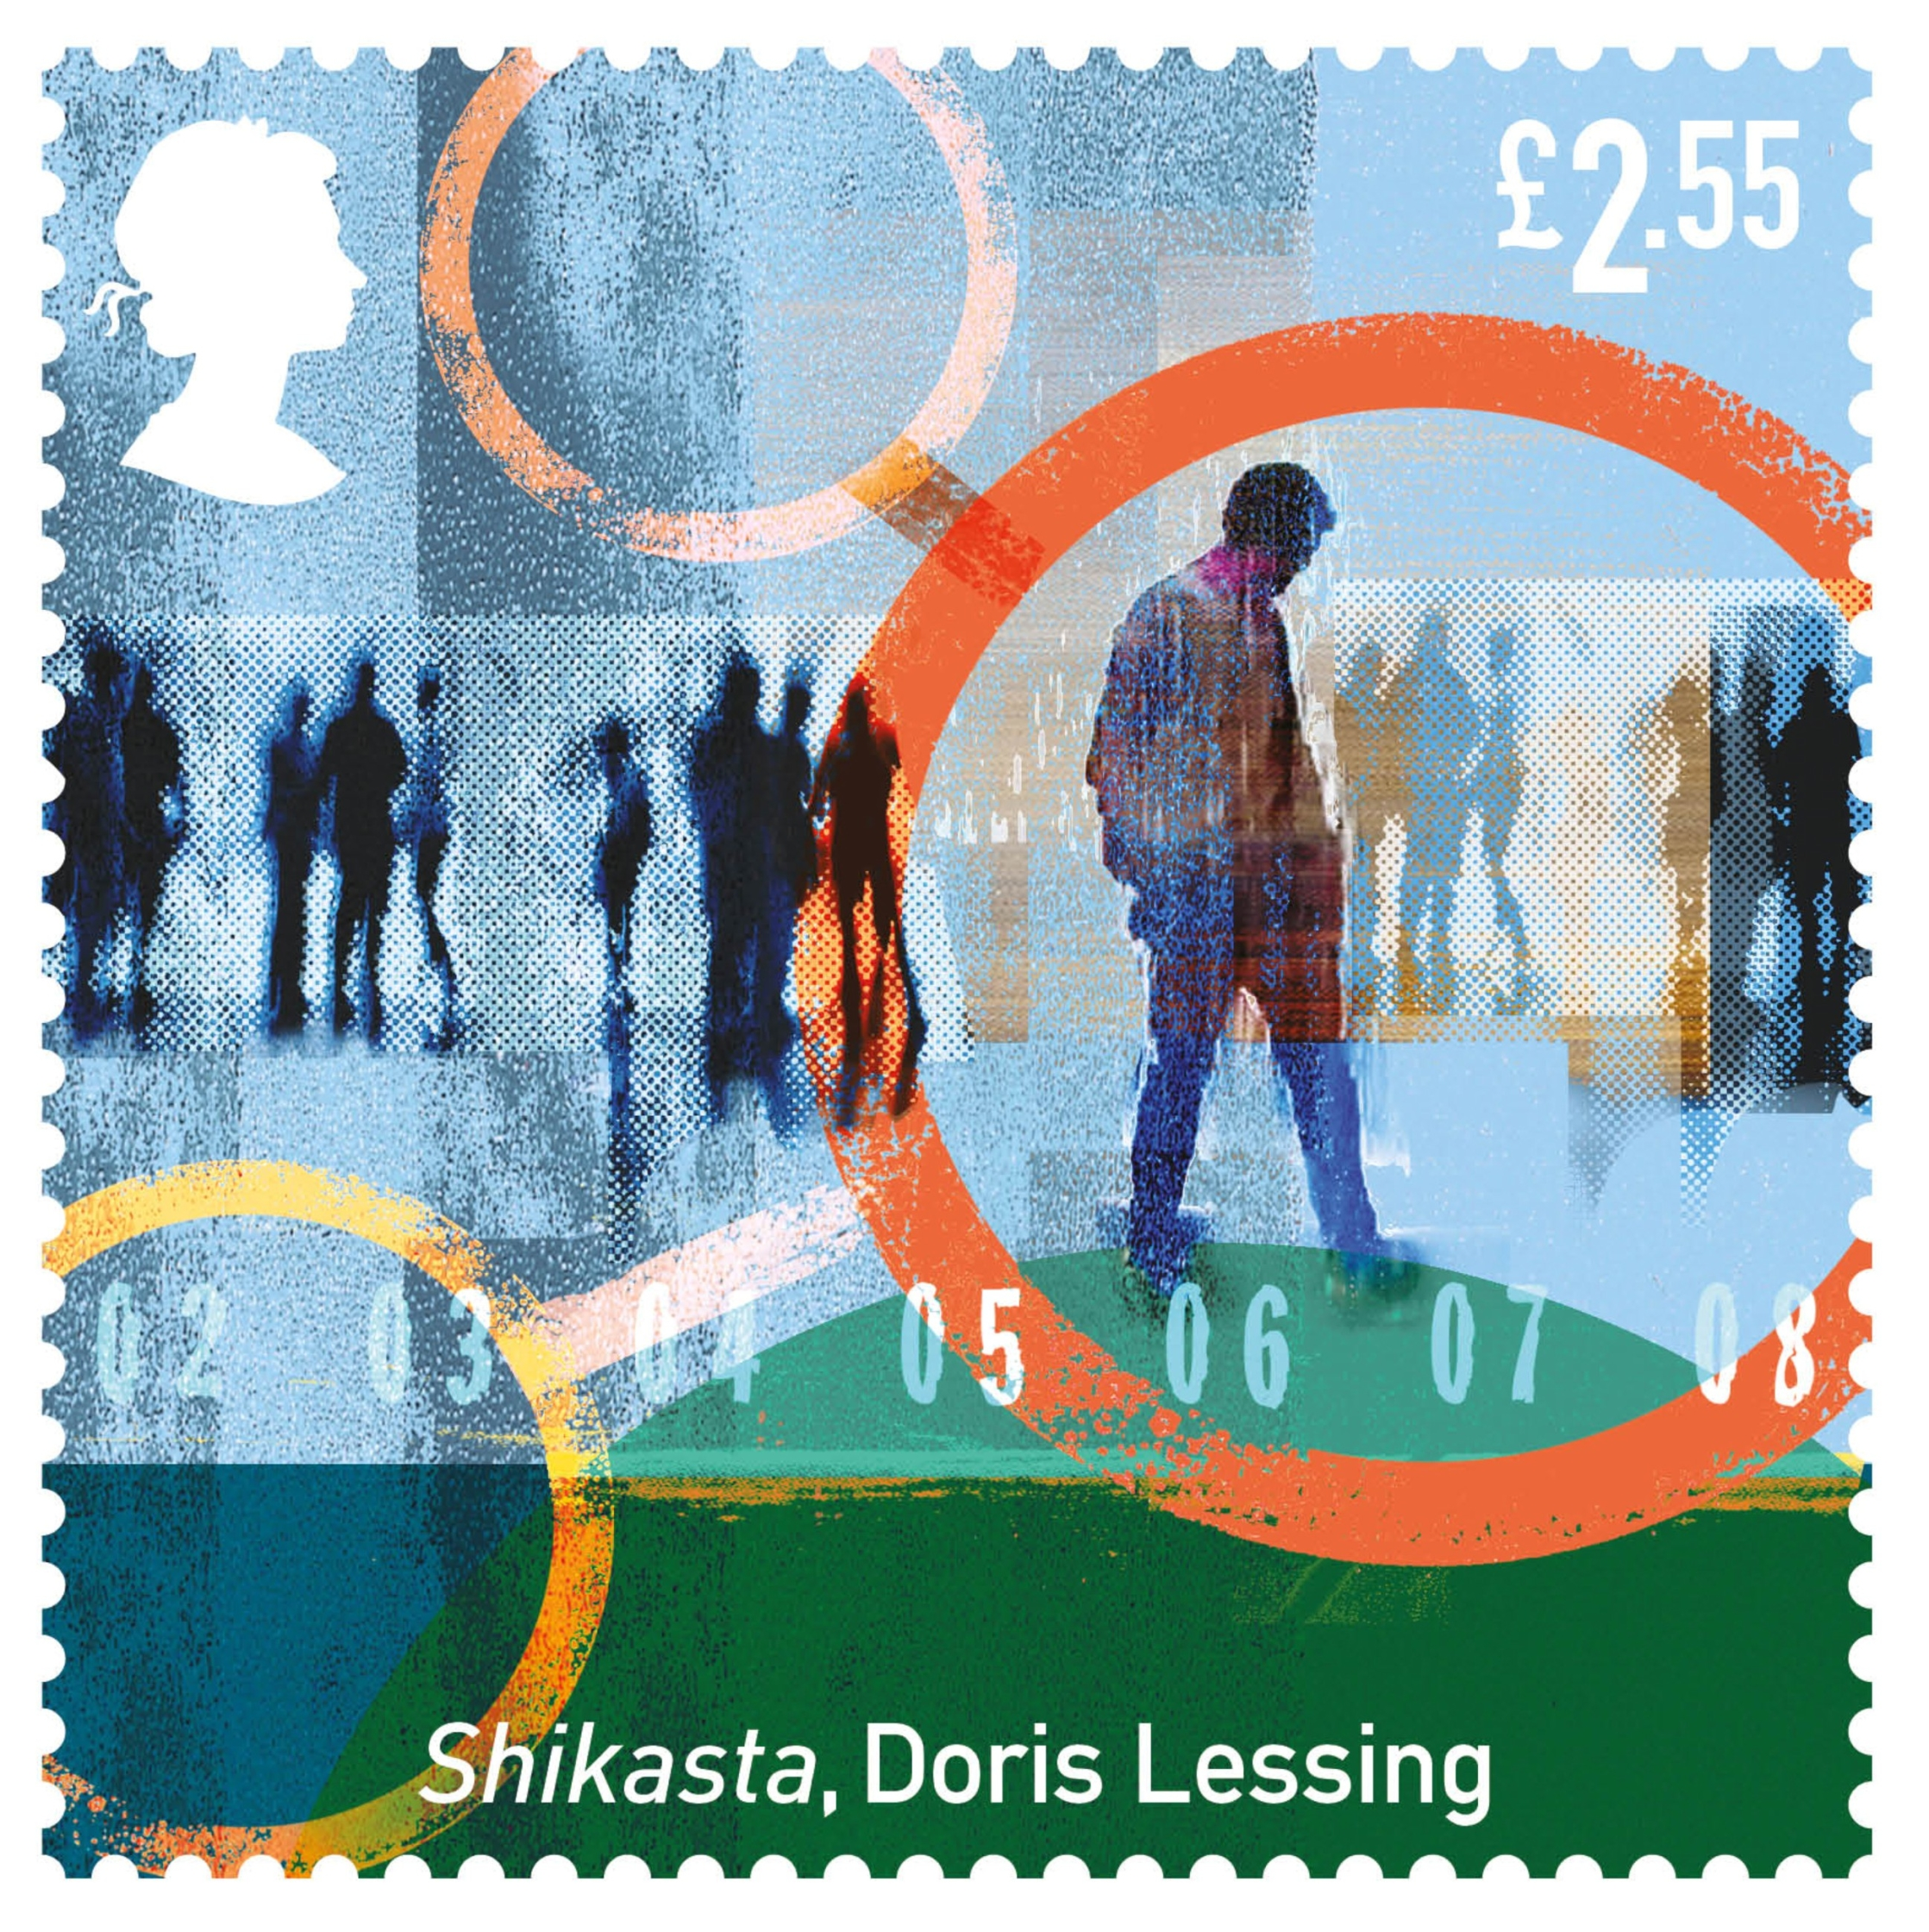 Classic Sci-Fi Shikasta stamp 400%.jpg